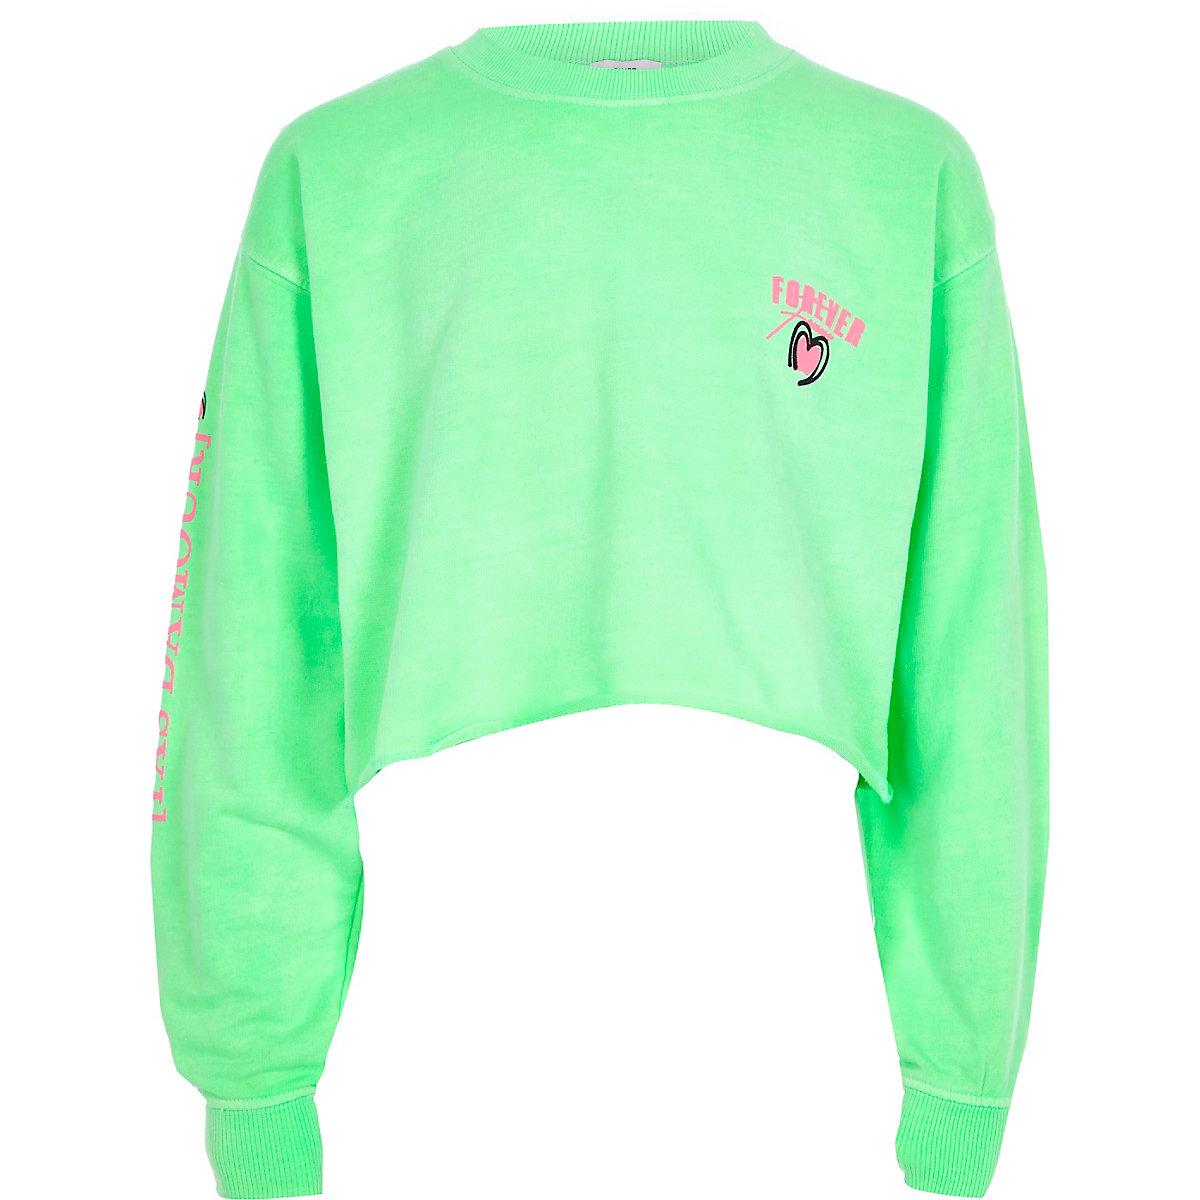 Girls bright green 'Forever' sweatshirt